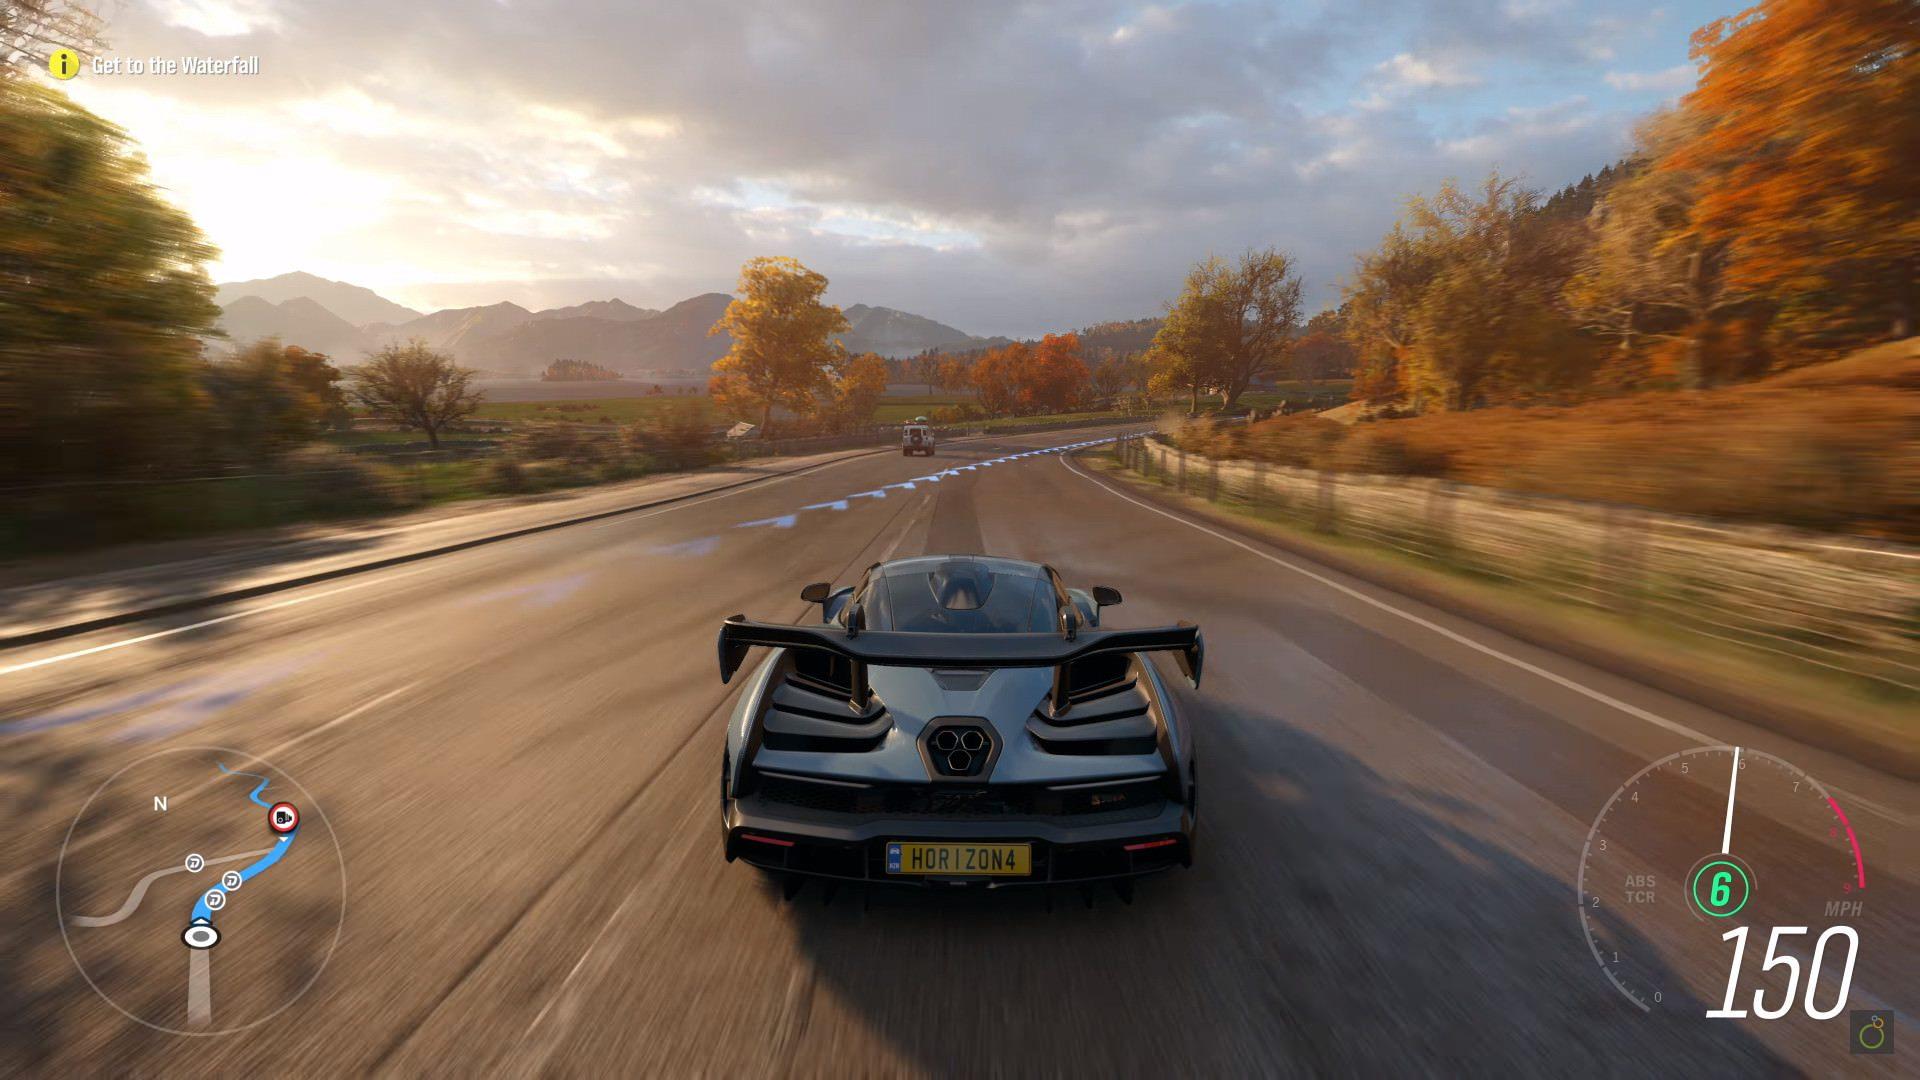 Forza Horizon 4's Graphics